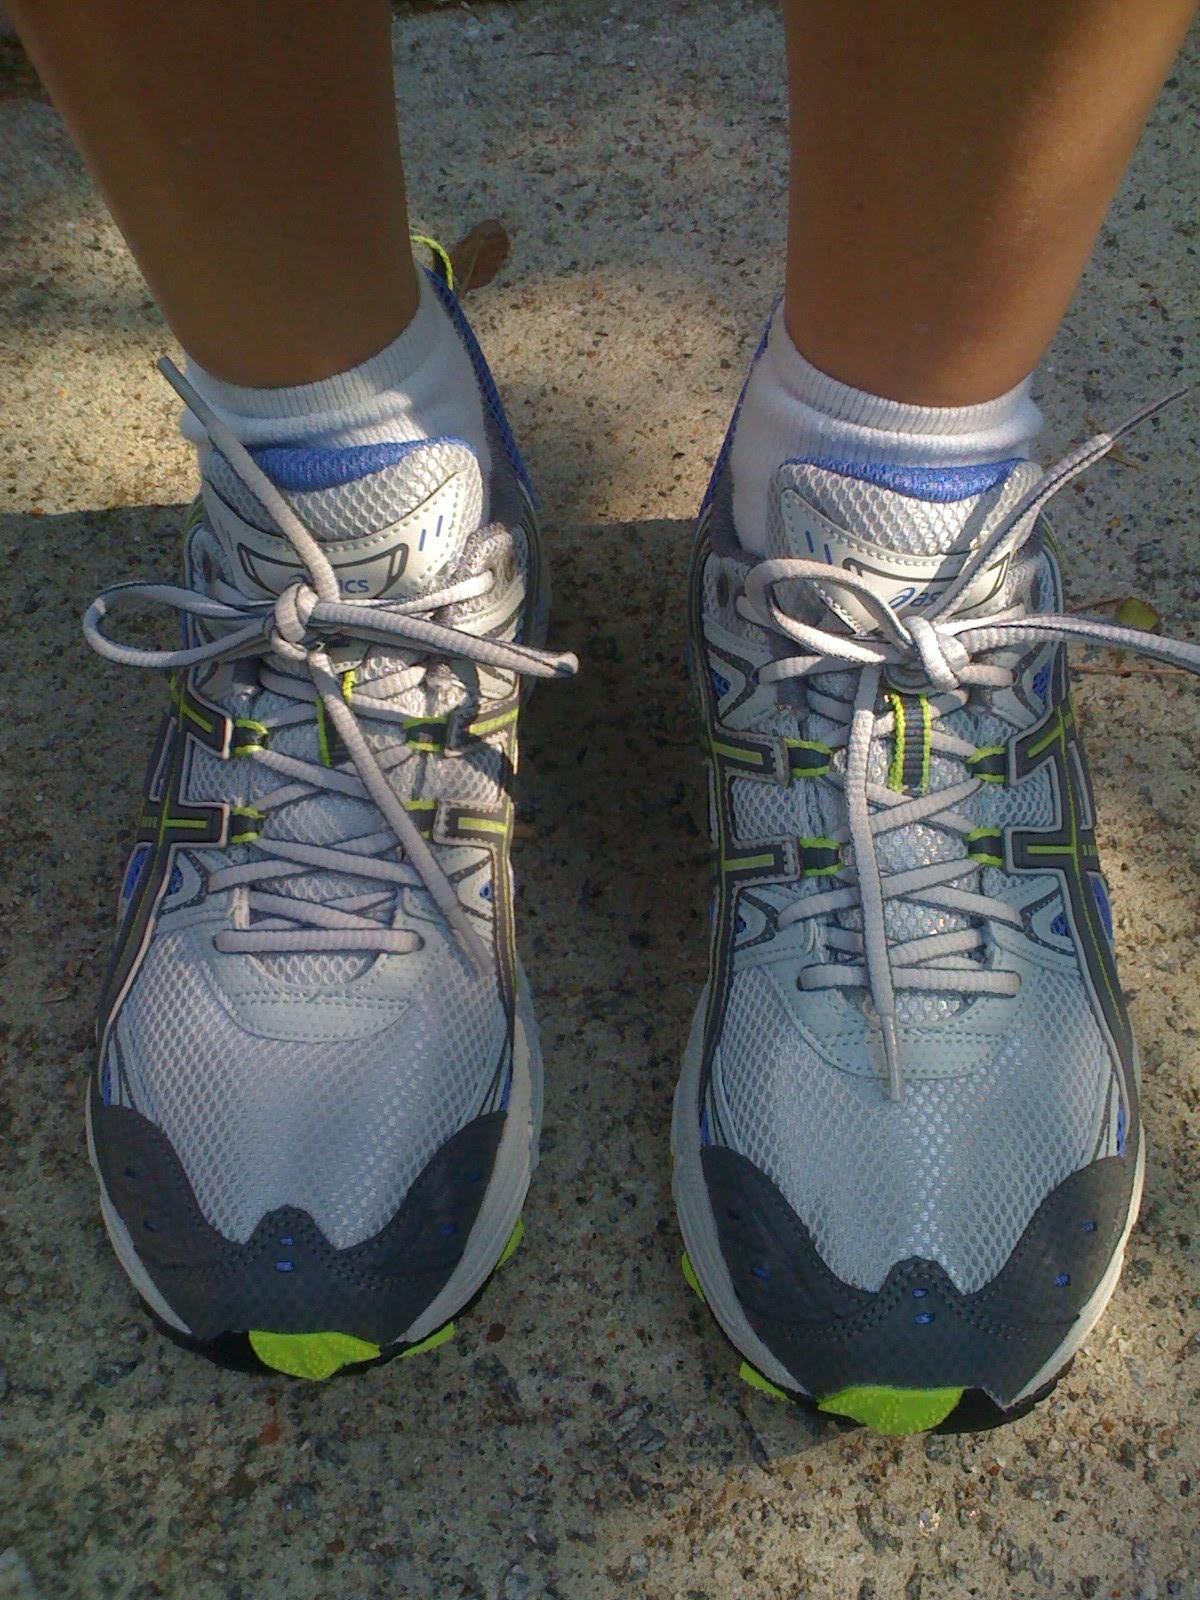 Recycle Running Shoes Atlanta